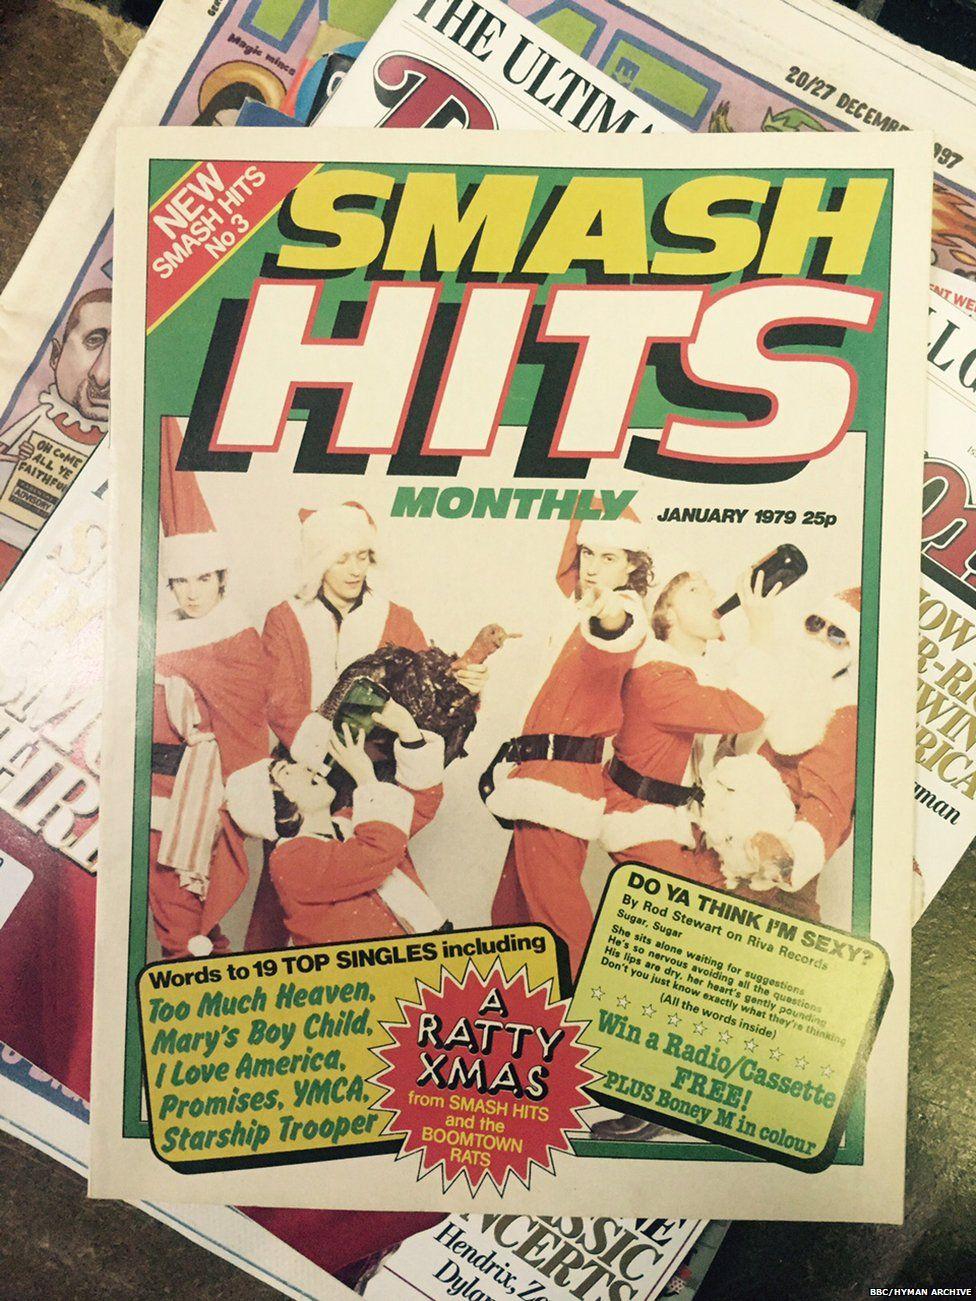 Smash Hits 1979